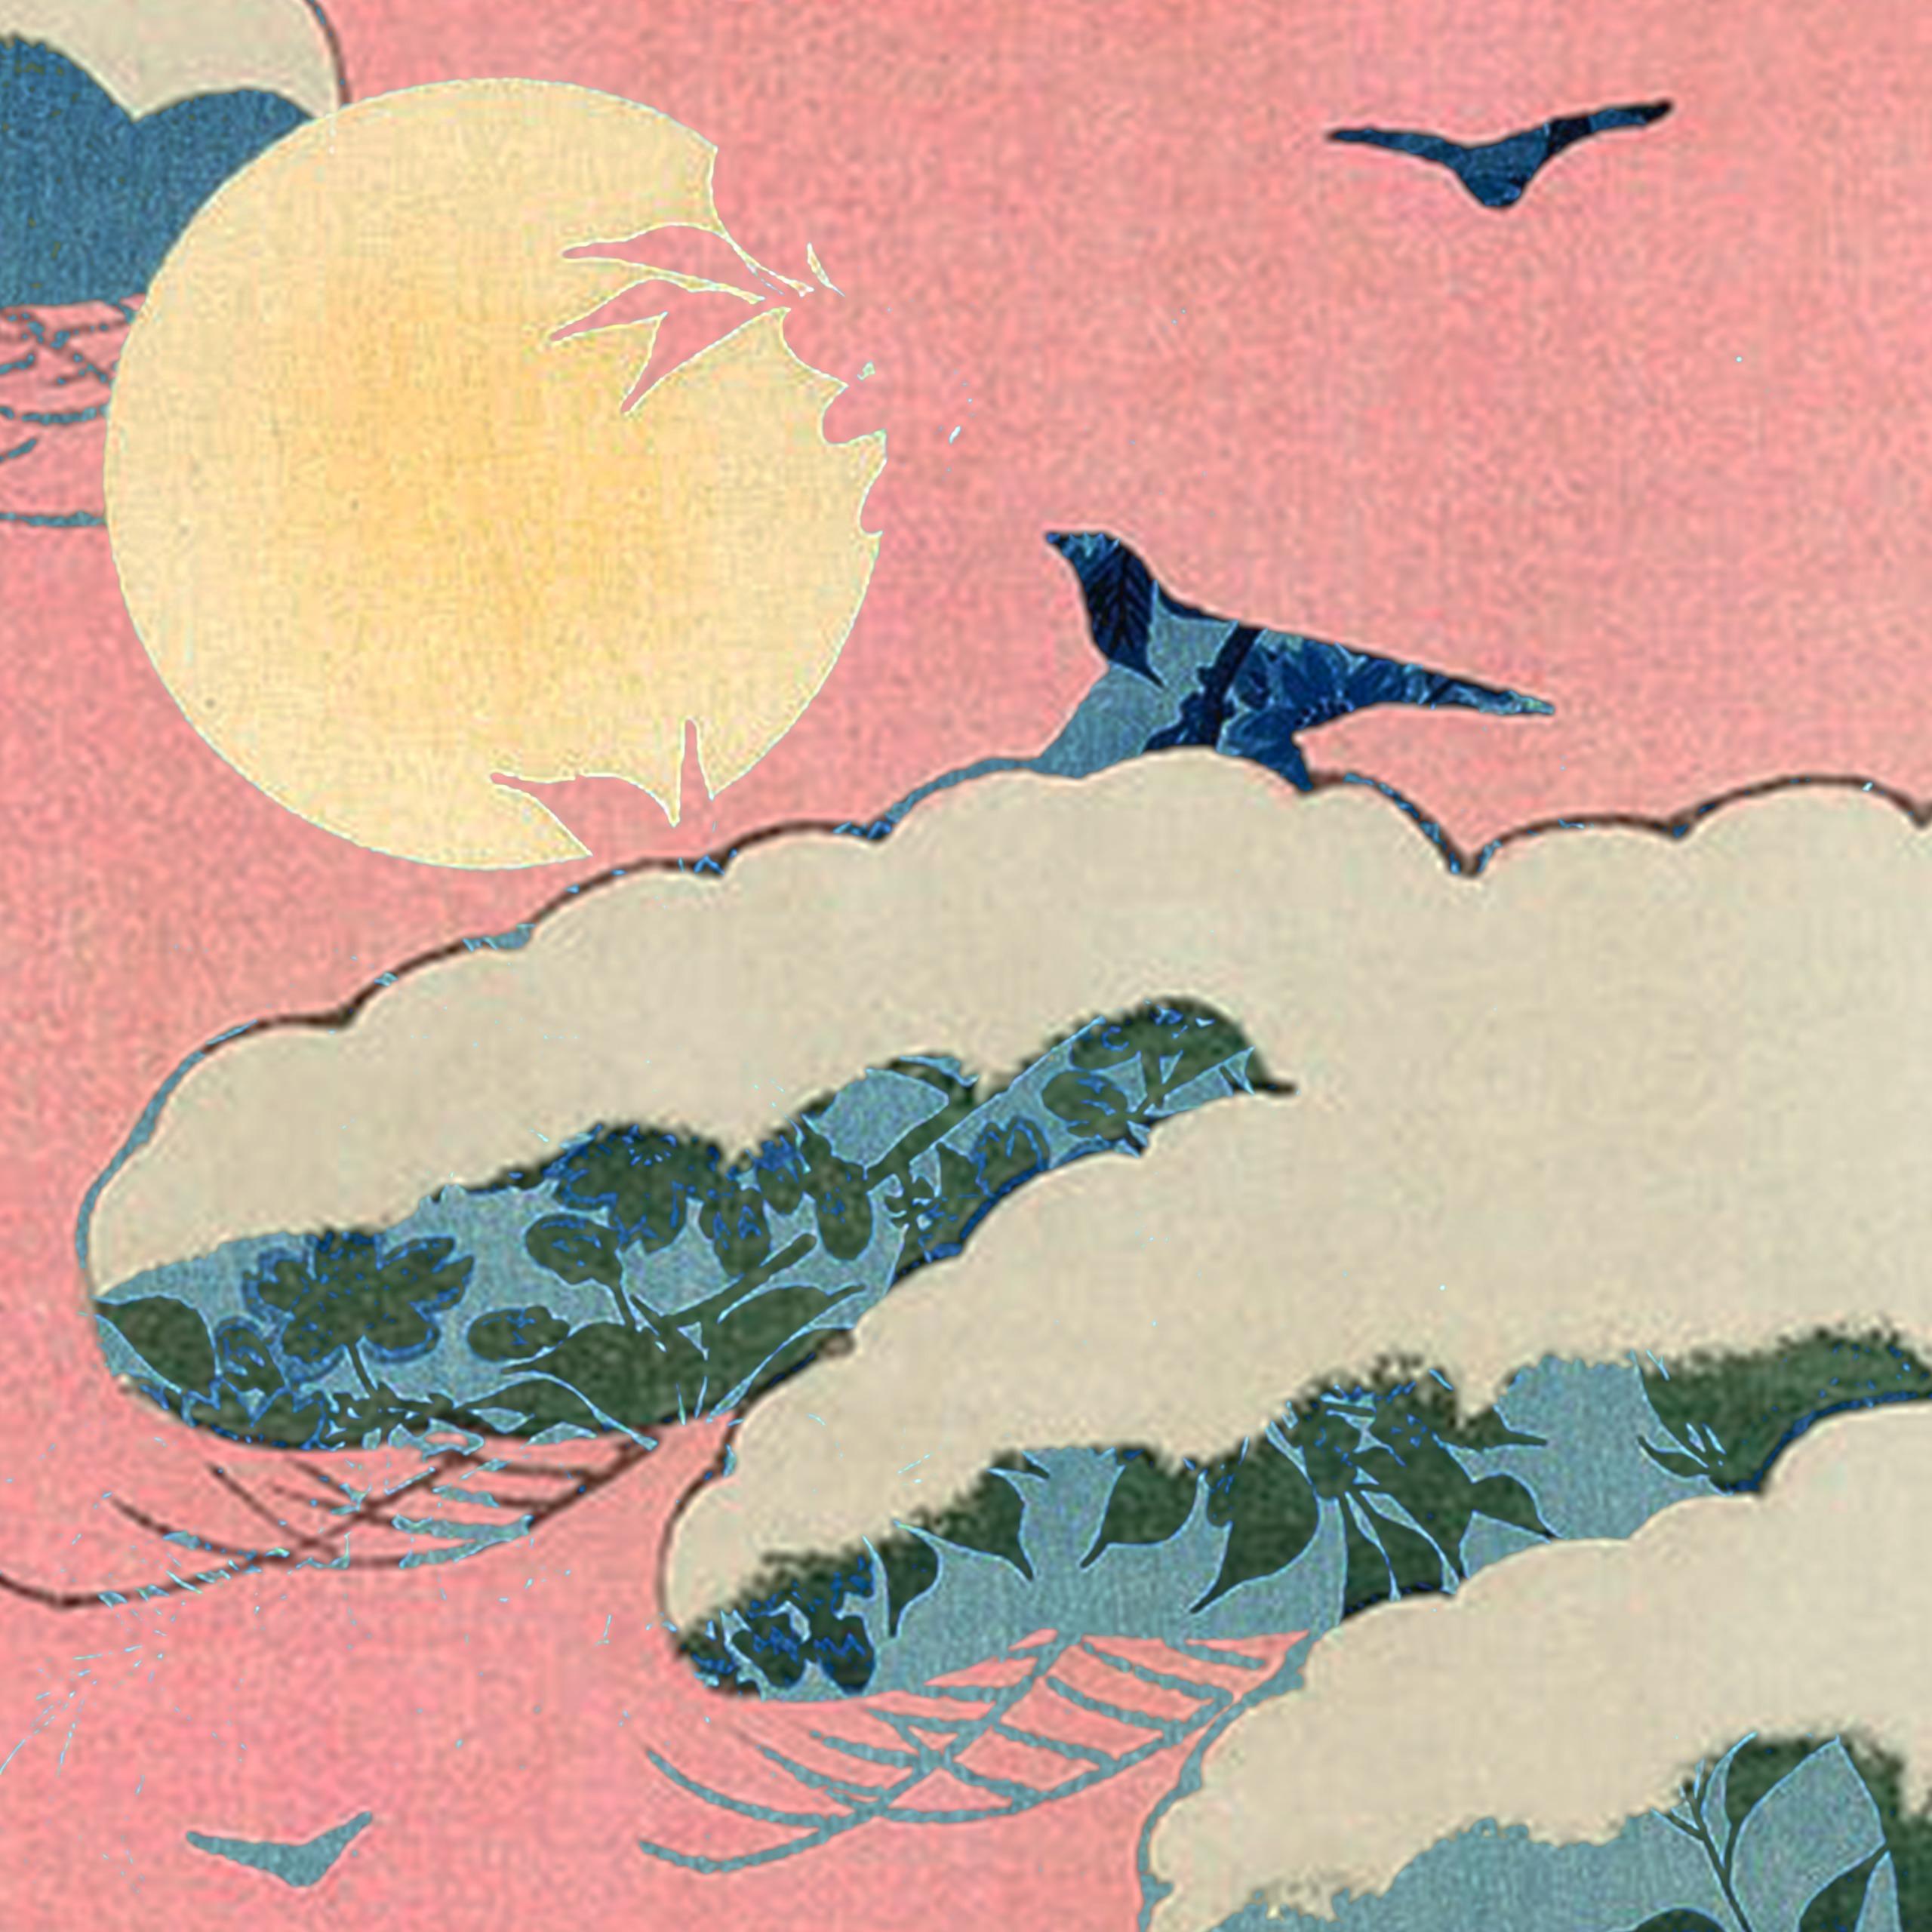 bird life - 002 - gungacolors   ello